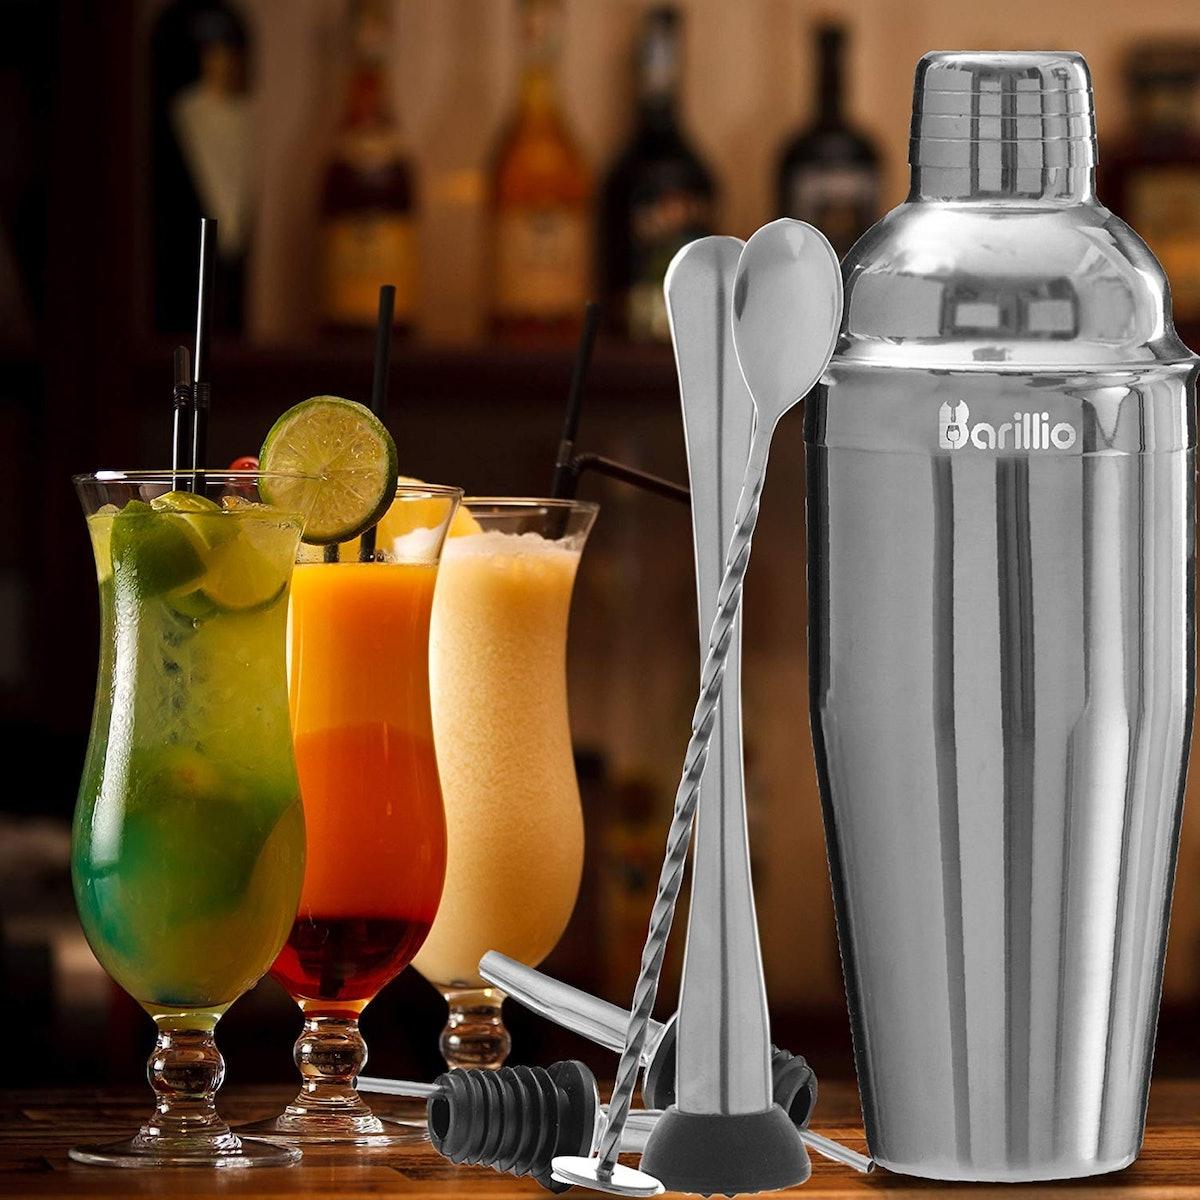 barillio Cocktail Set